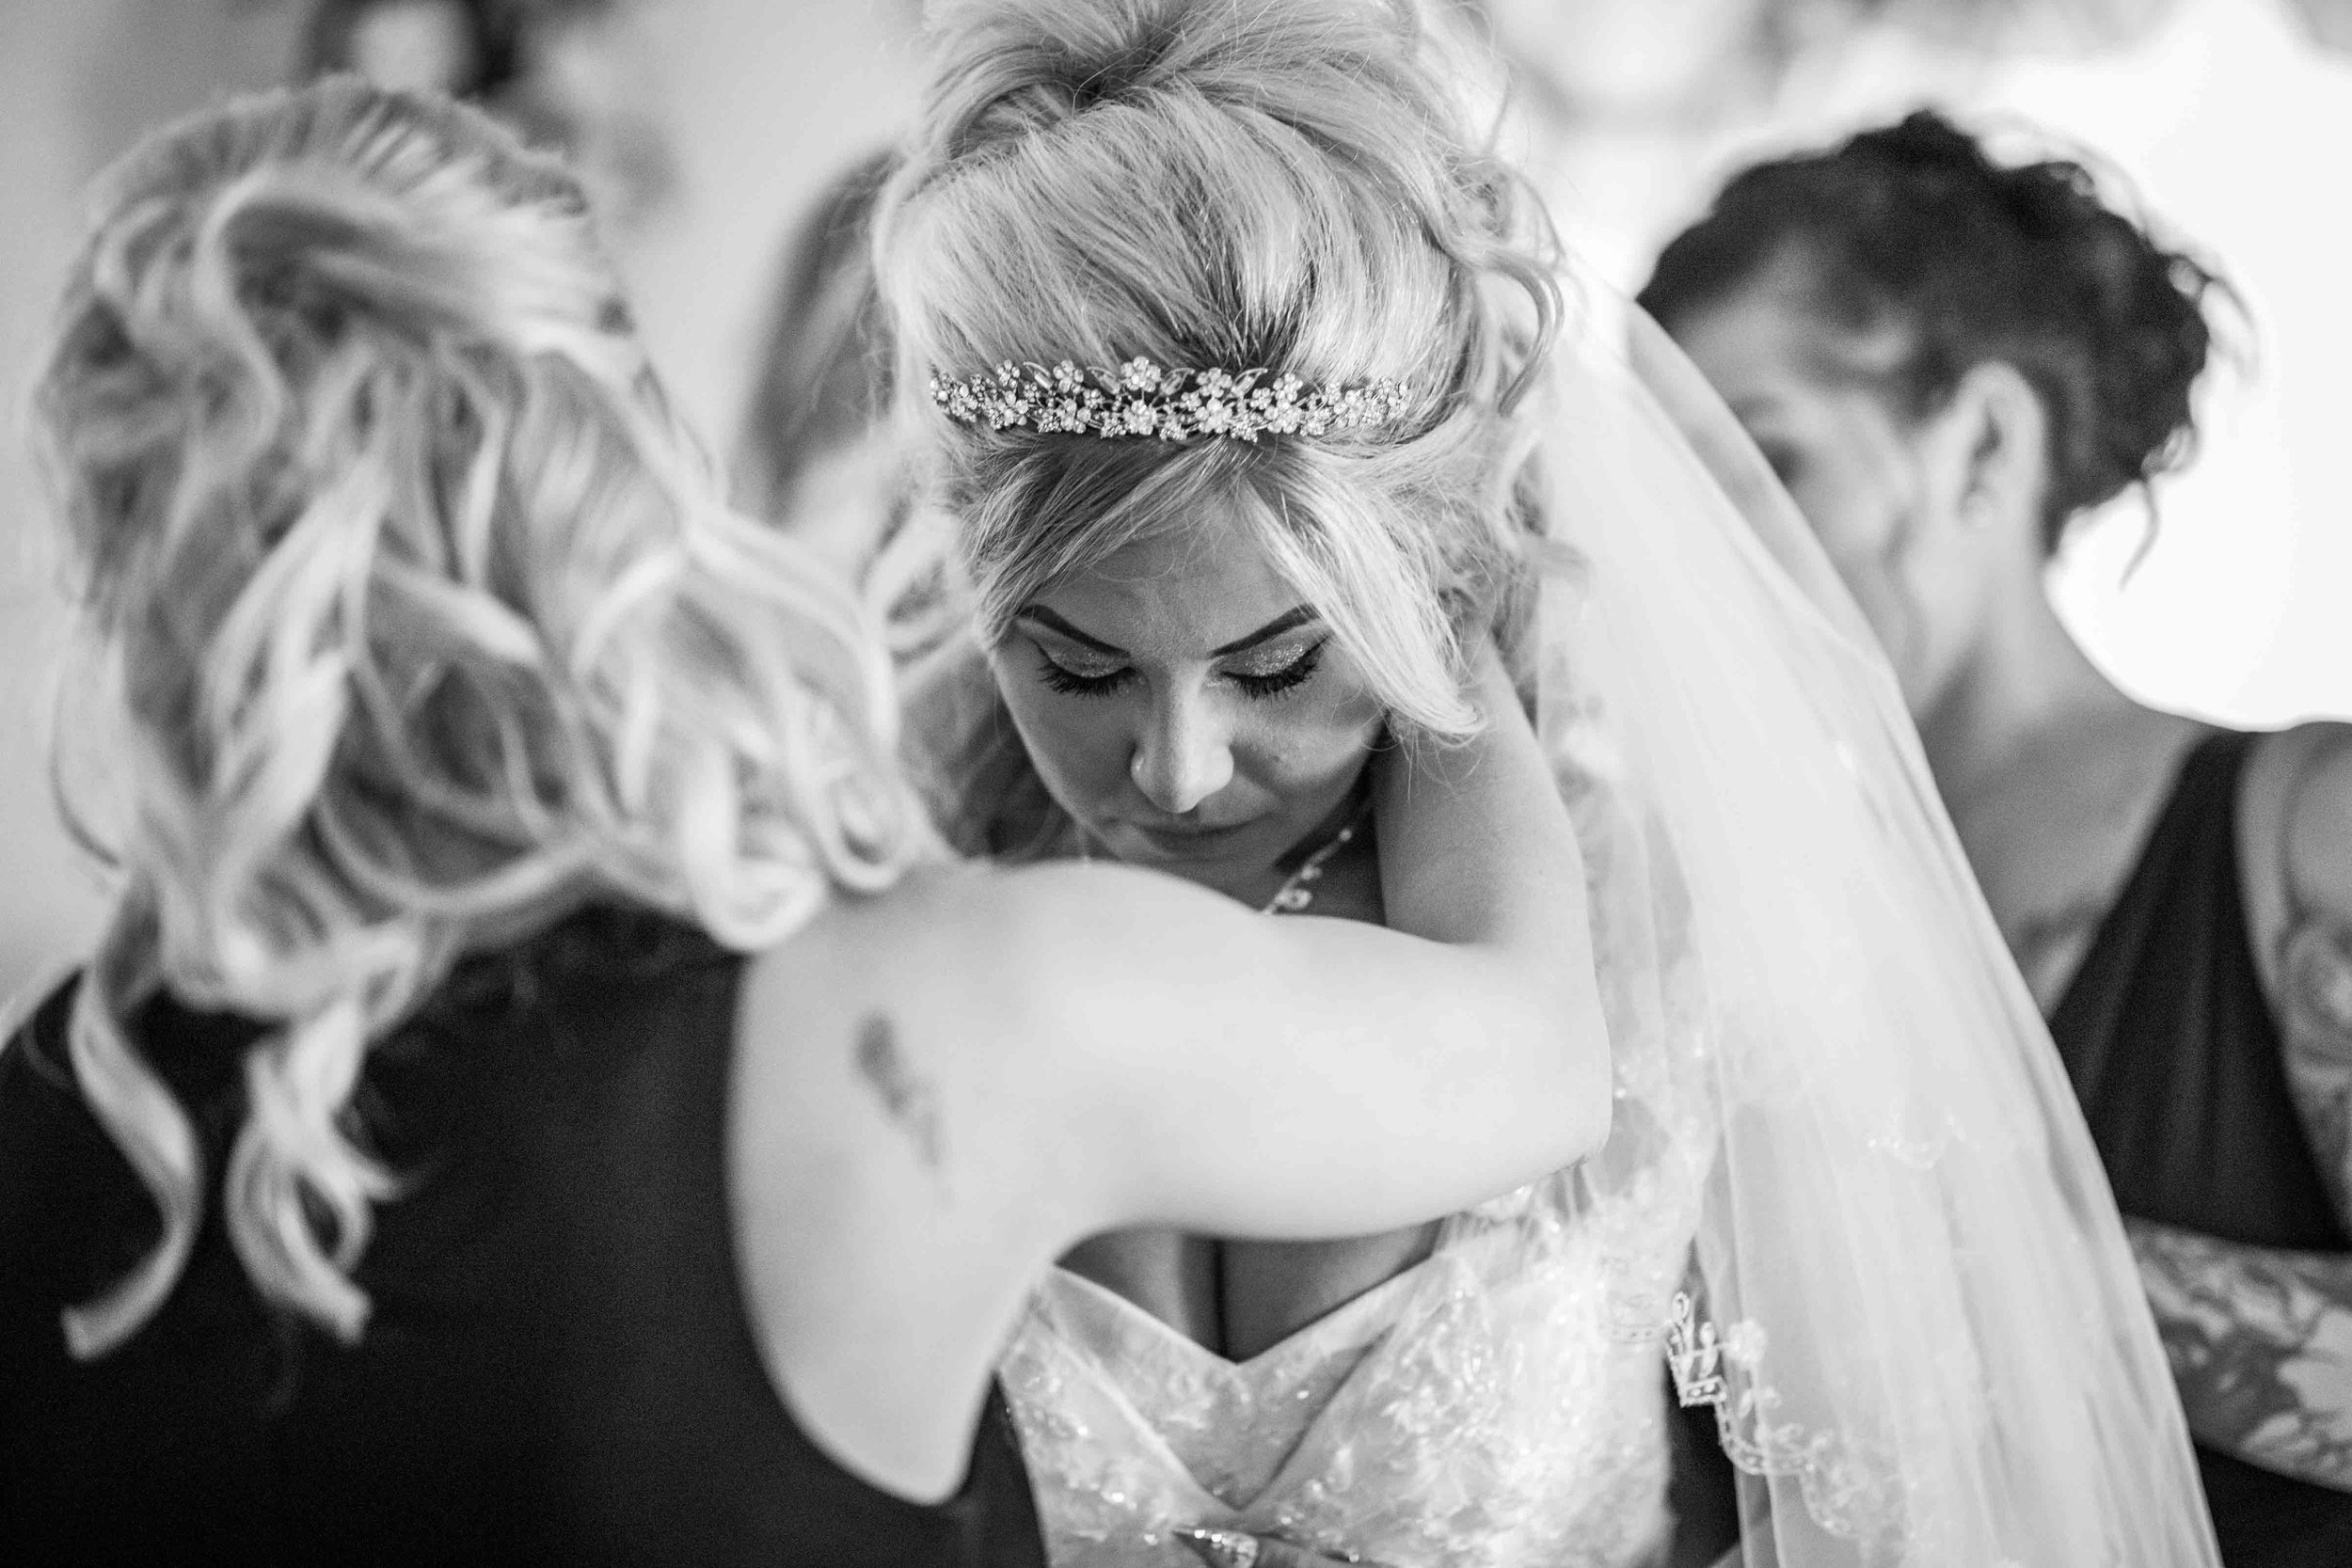 a friend puts a necklace around the bride